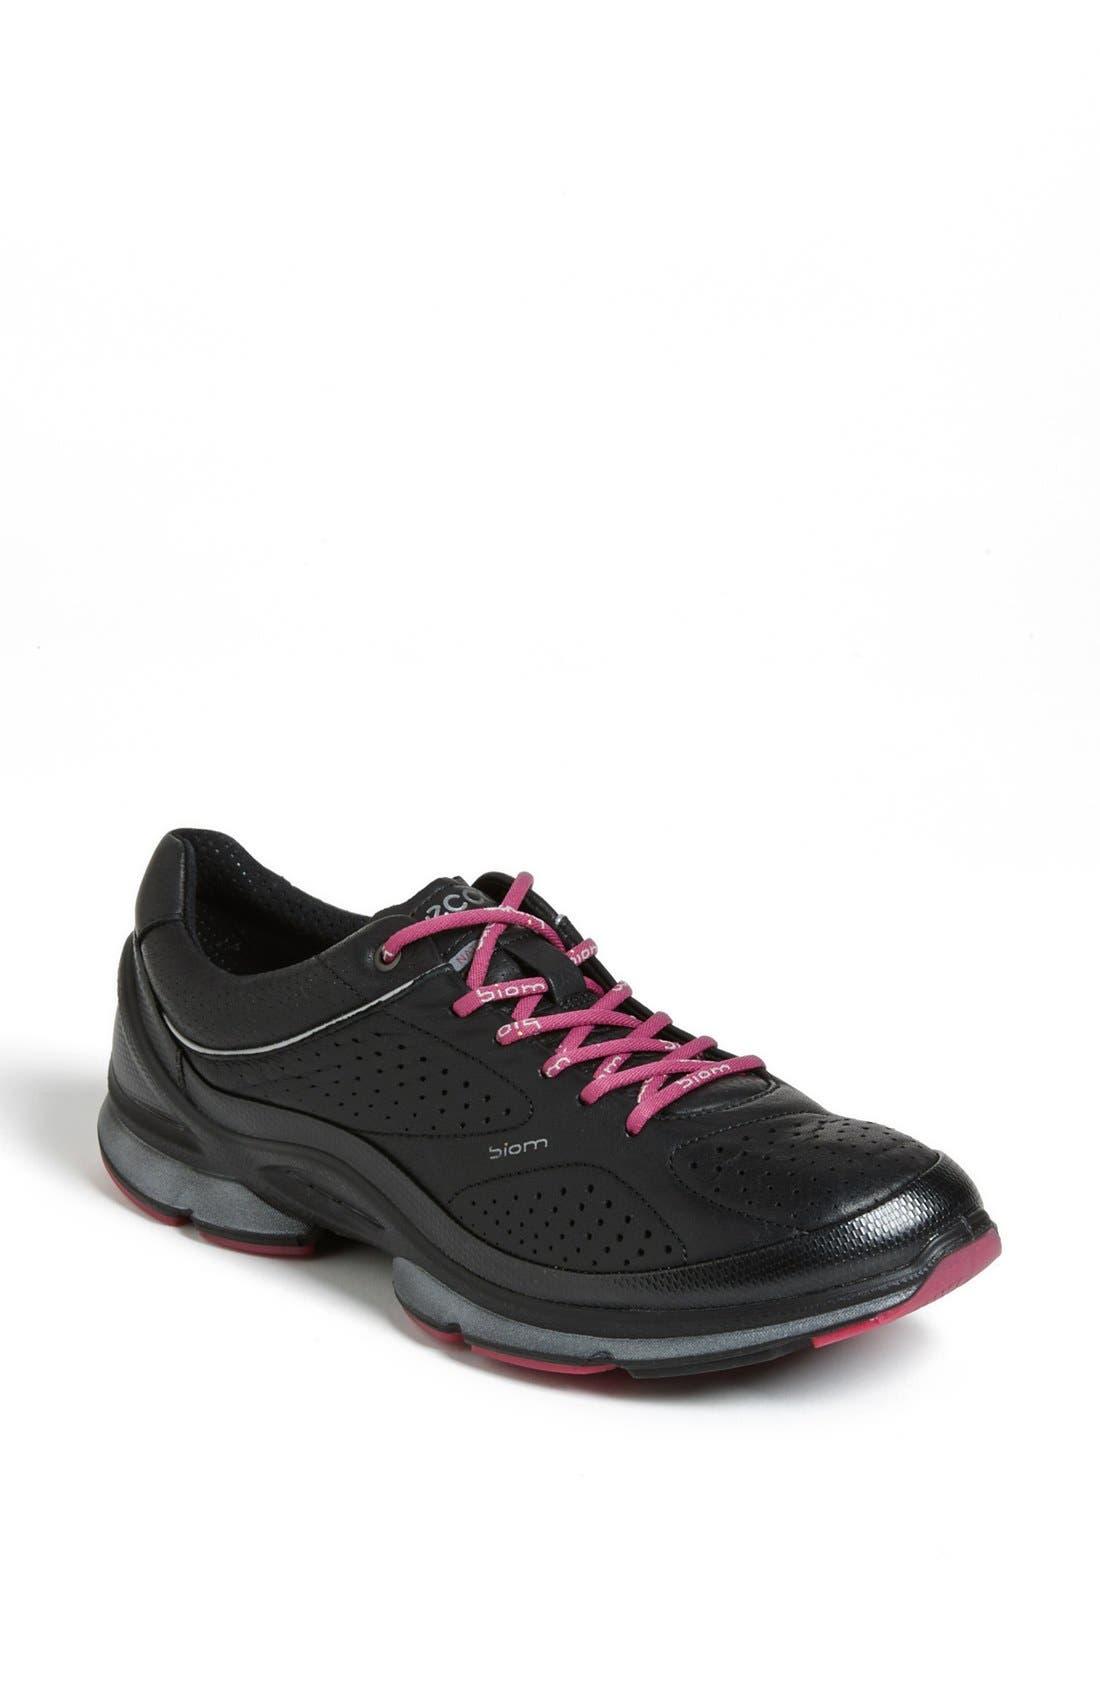 Main Image - ECCO 'Biom Evo Trainer Plus' Training Shoe (Women)